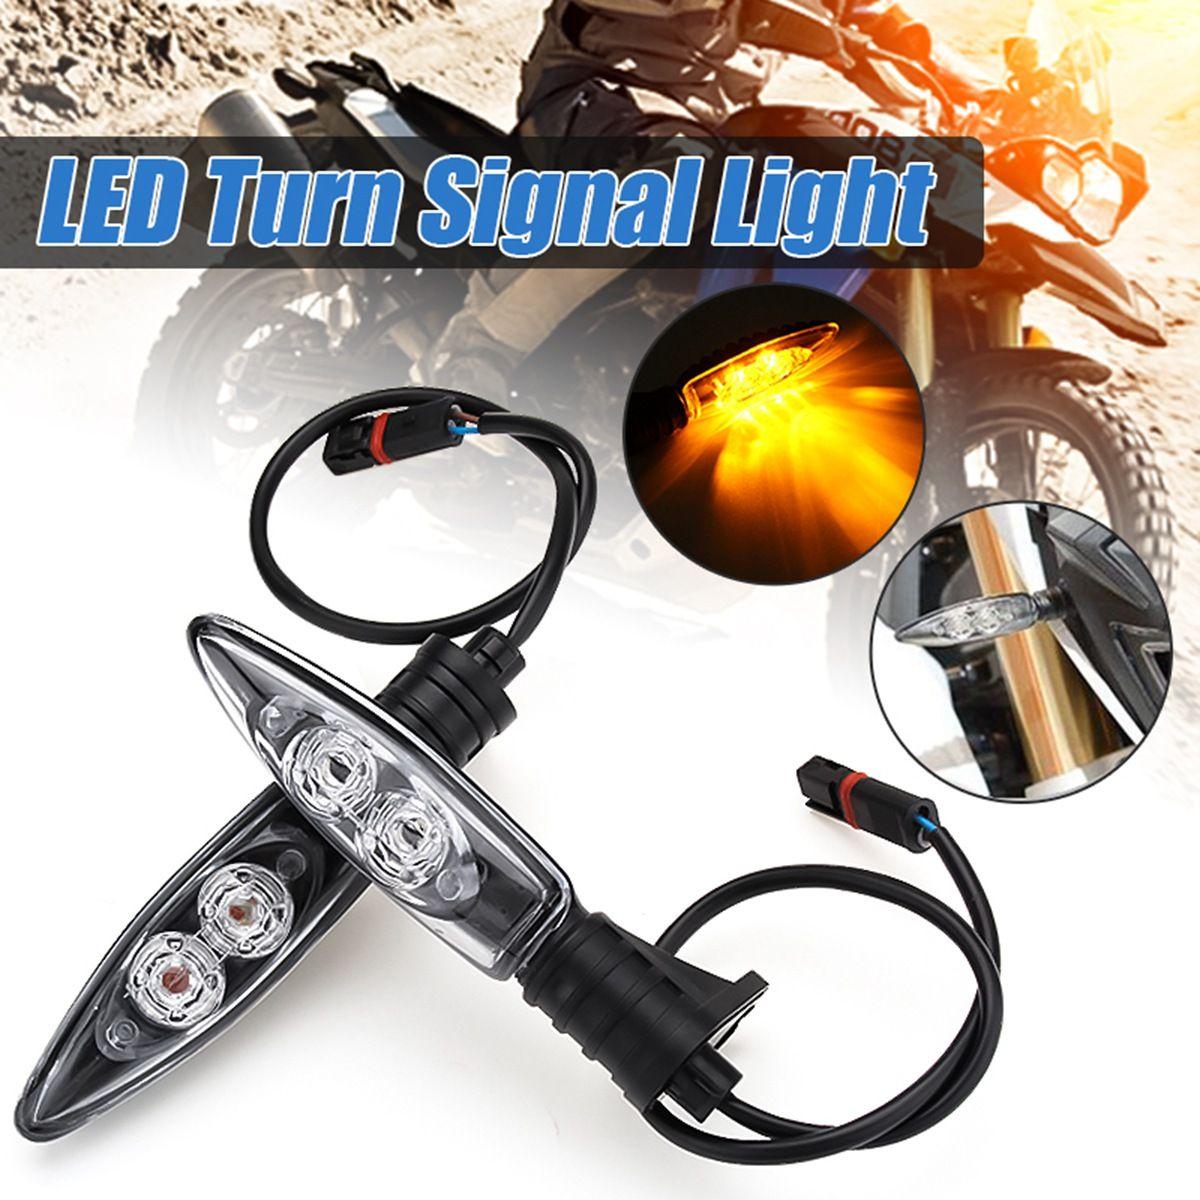 Pair Motorcycle Rear LED Turn Signal Light Indicator Lamp for BMW S1000RR HP4 F700GS F800GS F800R s1000rr turn led lights